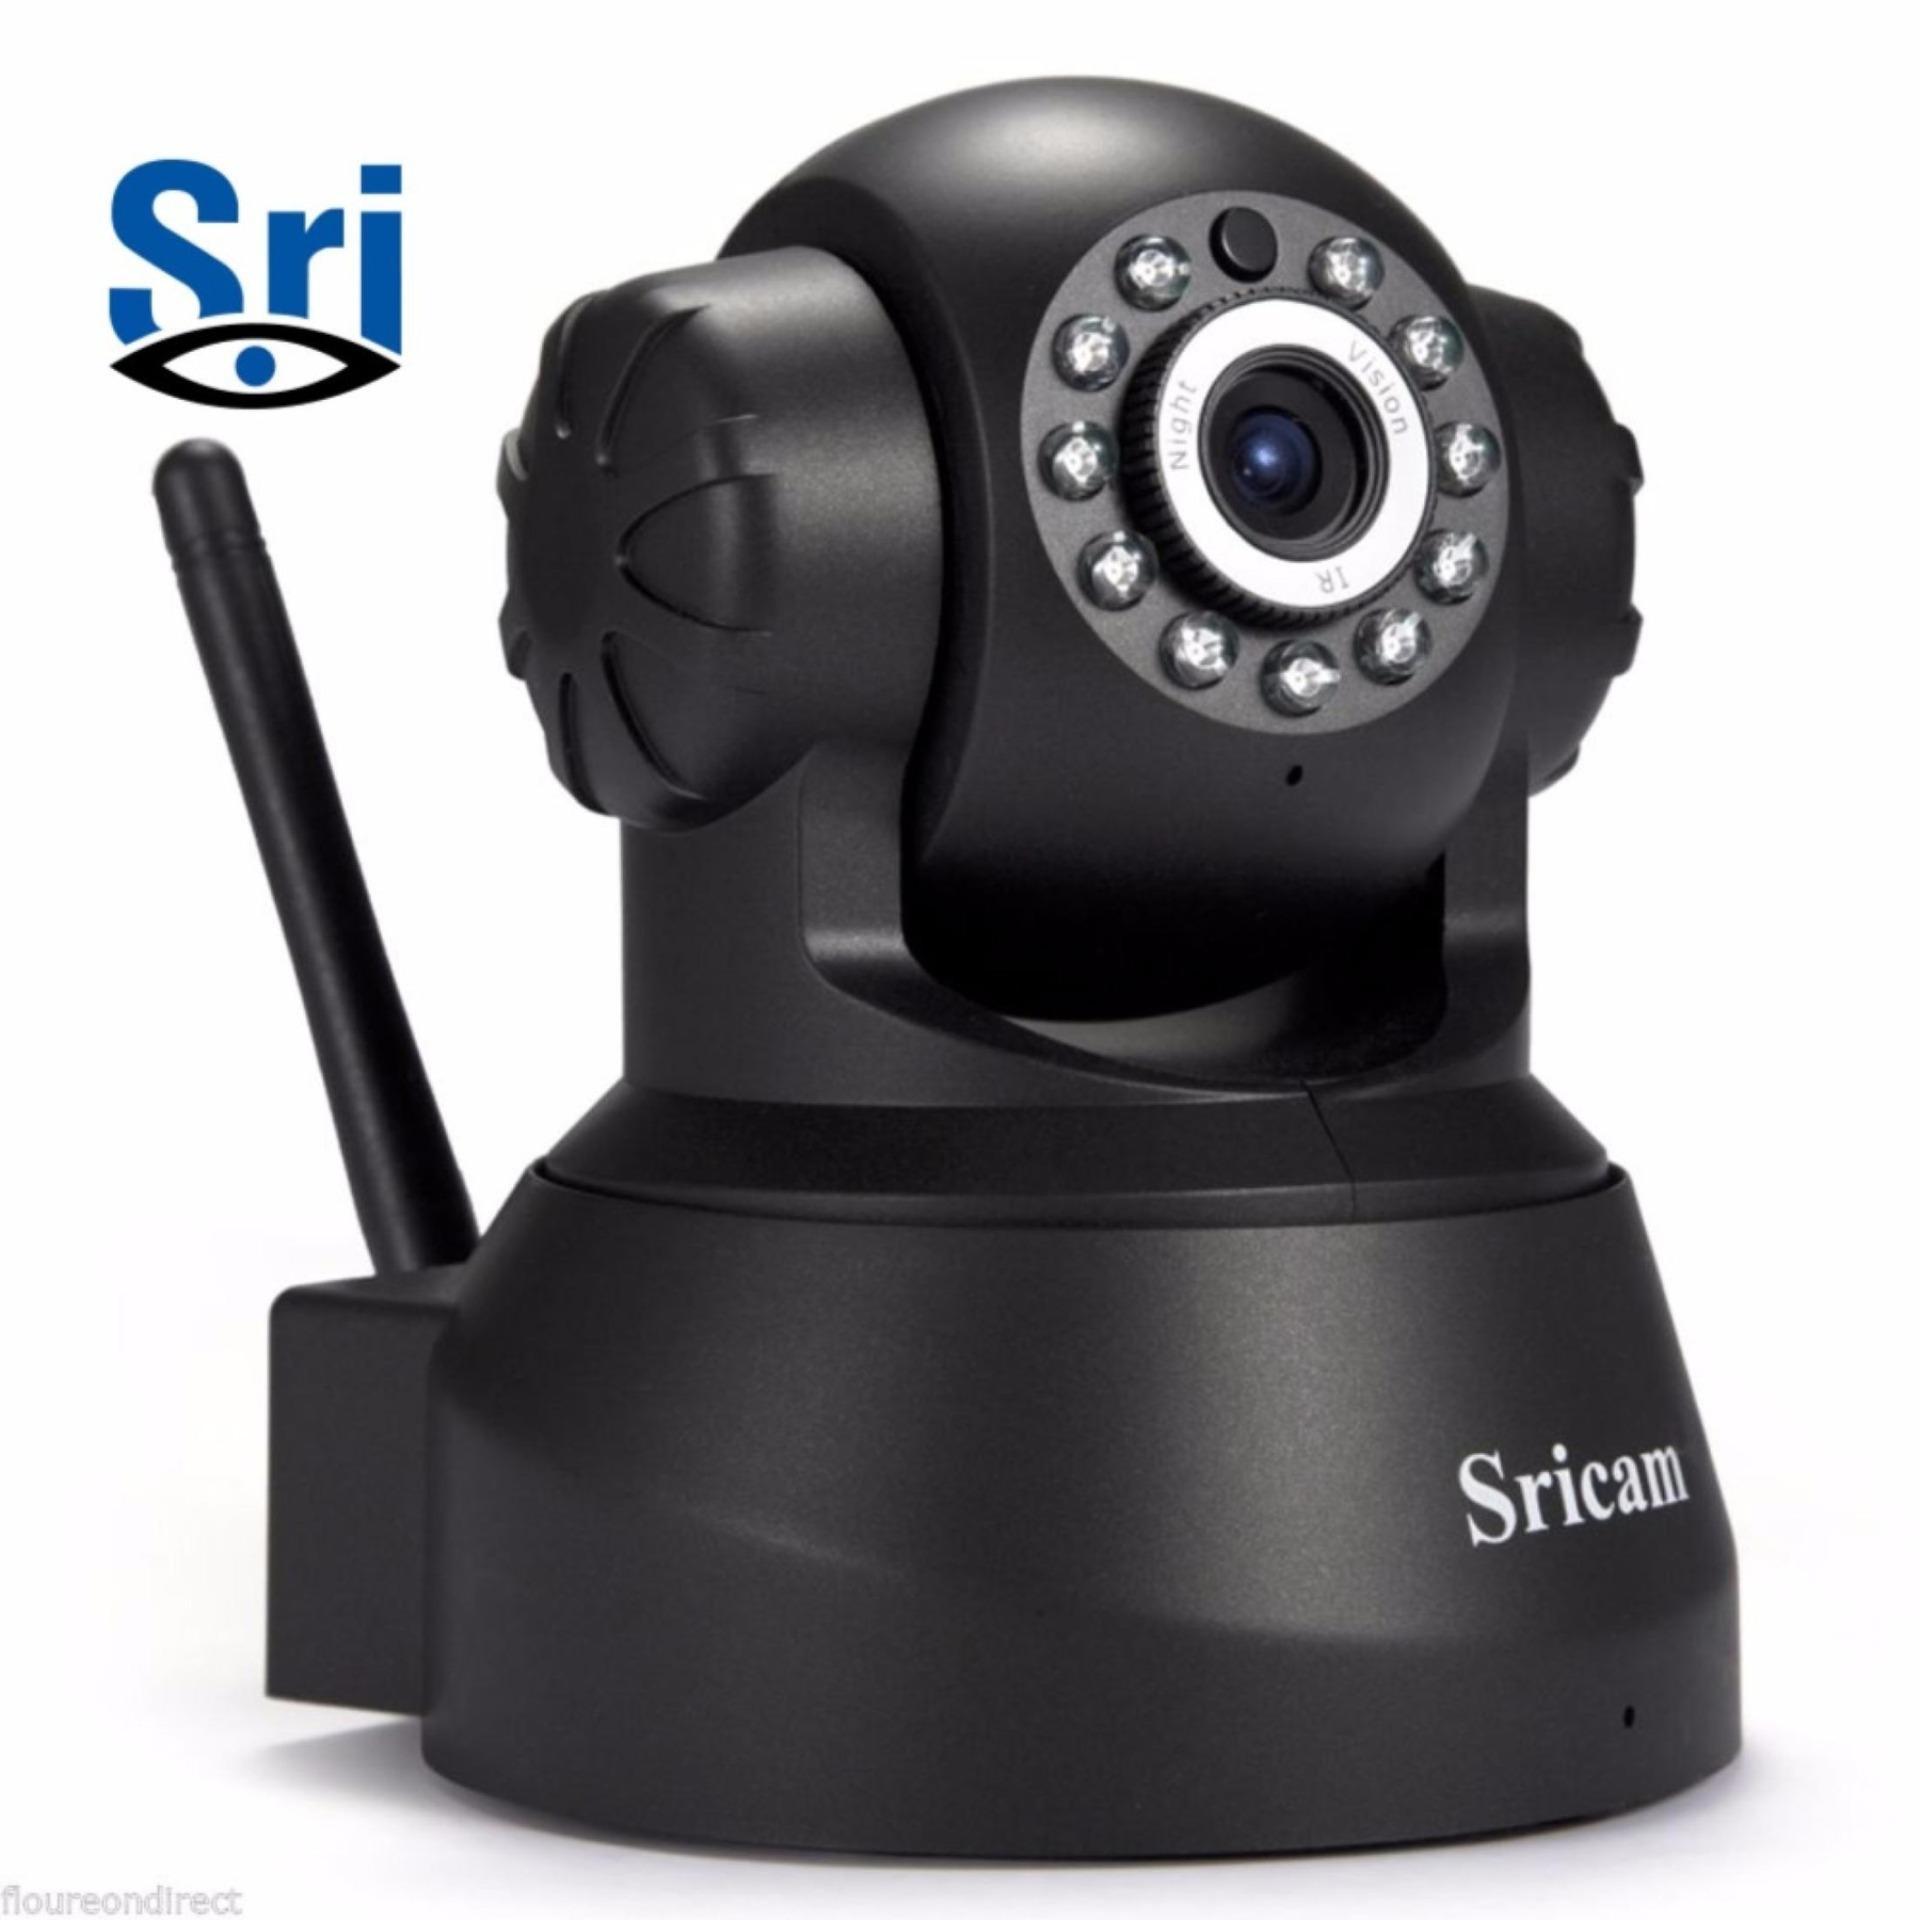 Sricam SP012 Wifi CCTV w  Pan Tilt   Motion Detection Alarm Camera 618ad29d92